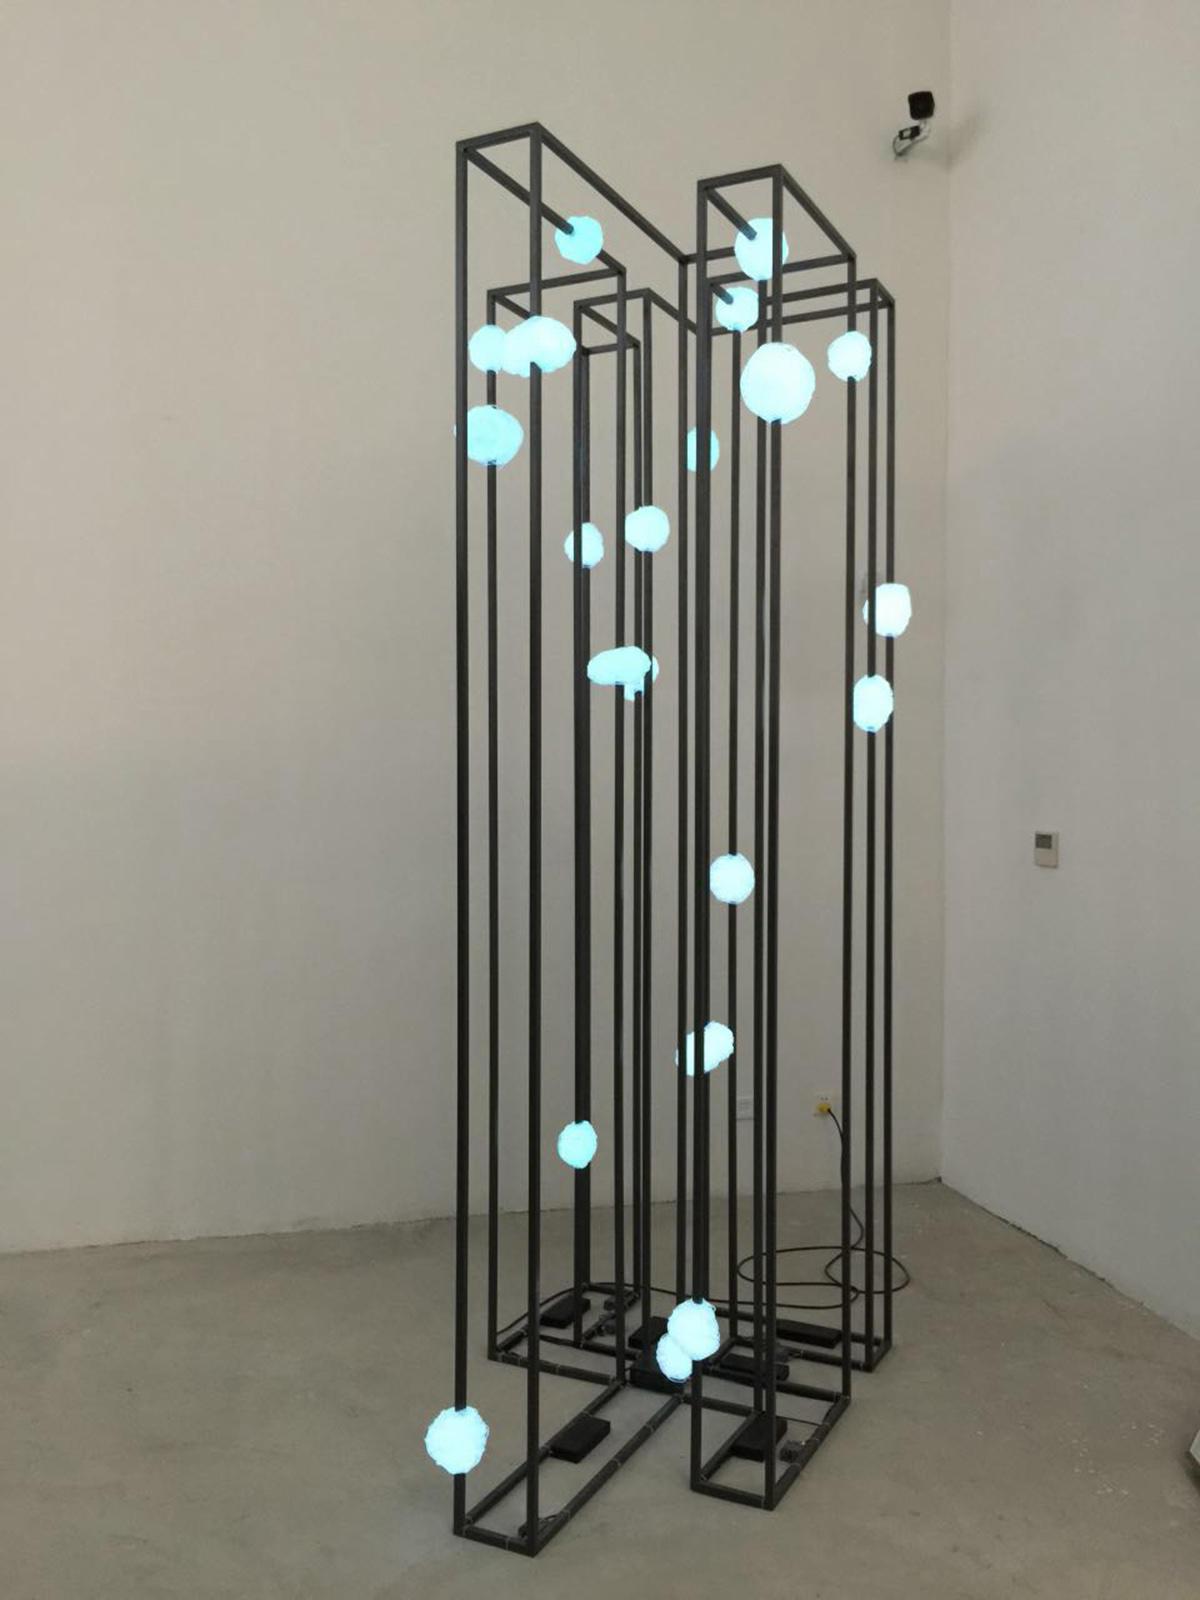 无题 2015 EL冷光线 铁架 EL neon rope light iron frame 147x100x300cm